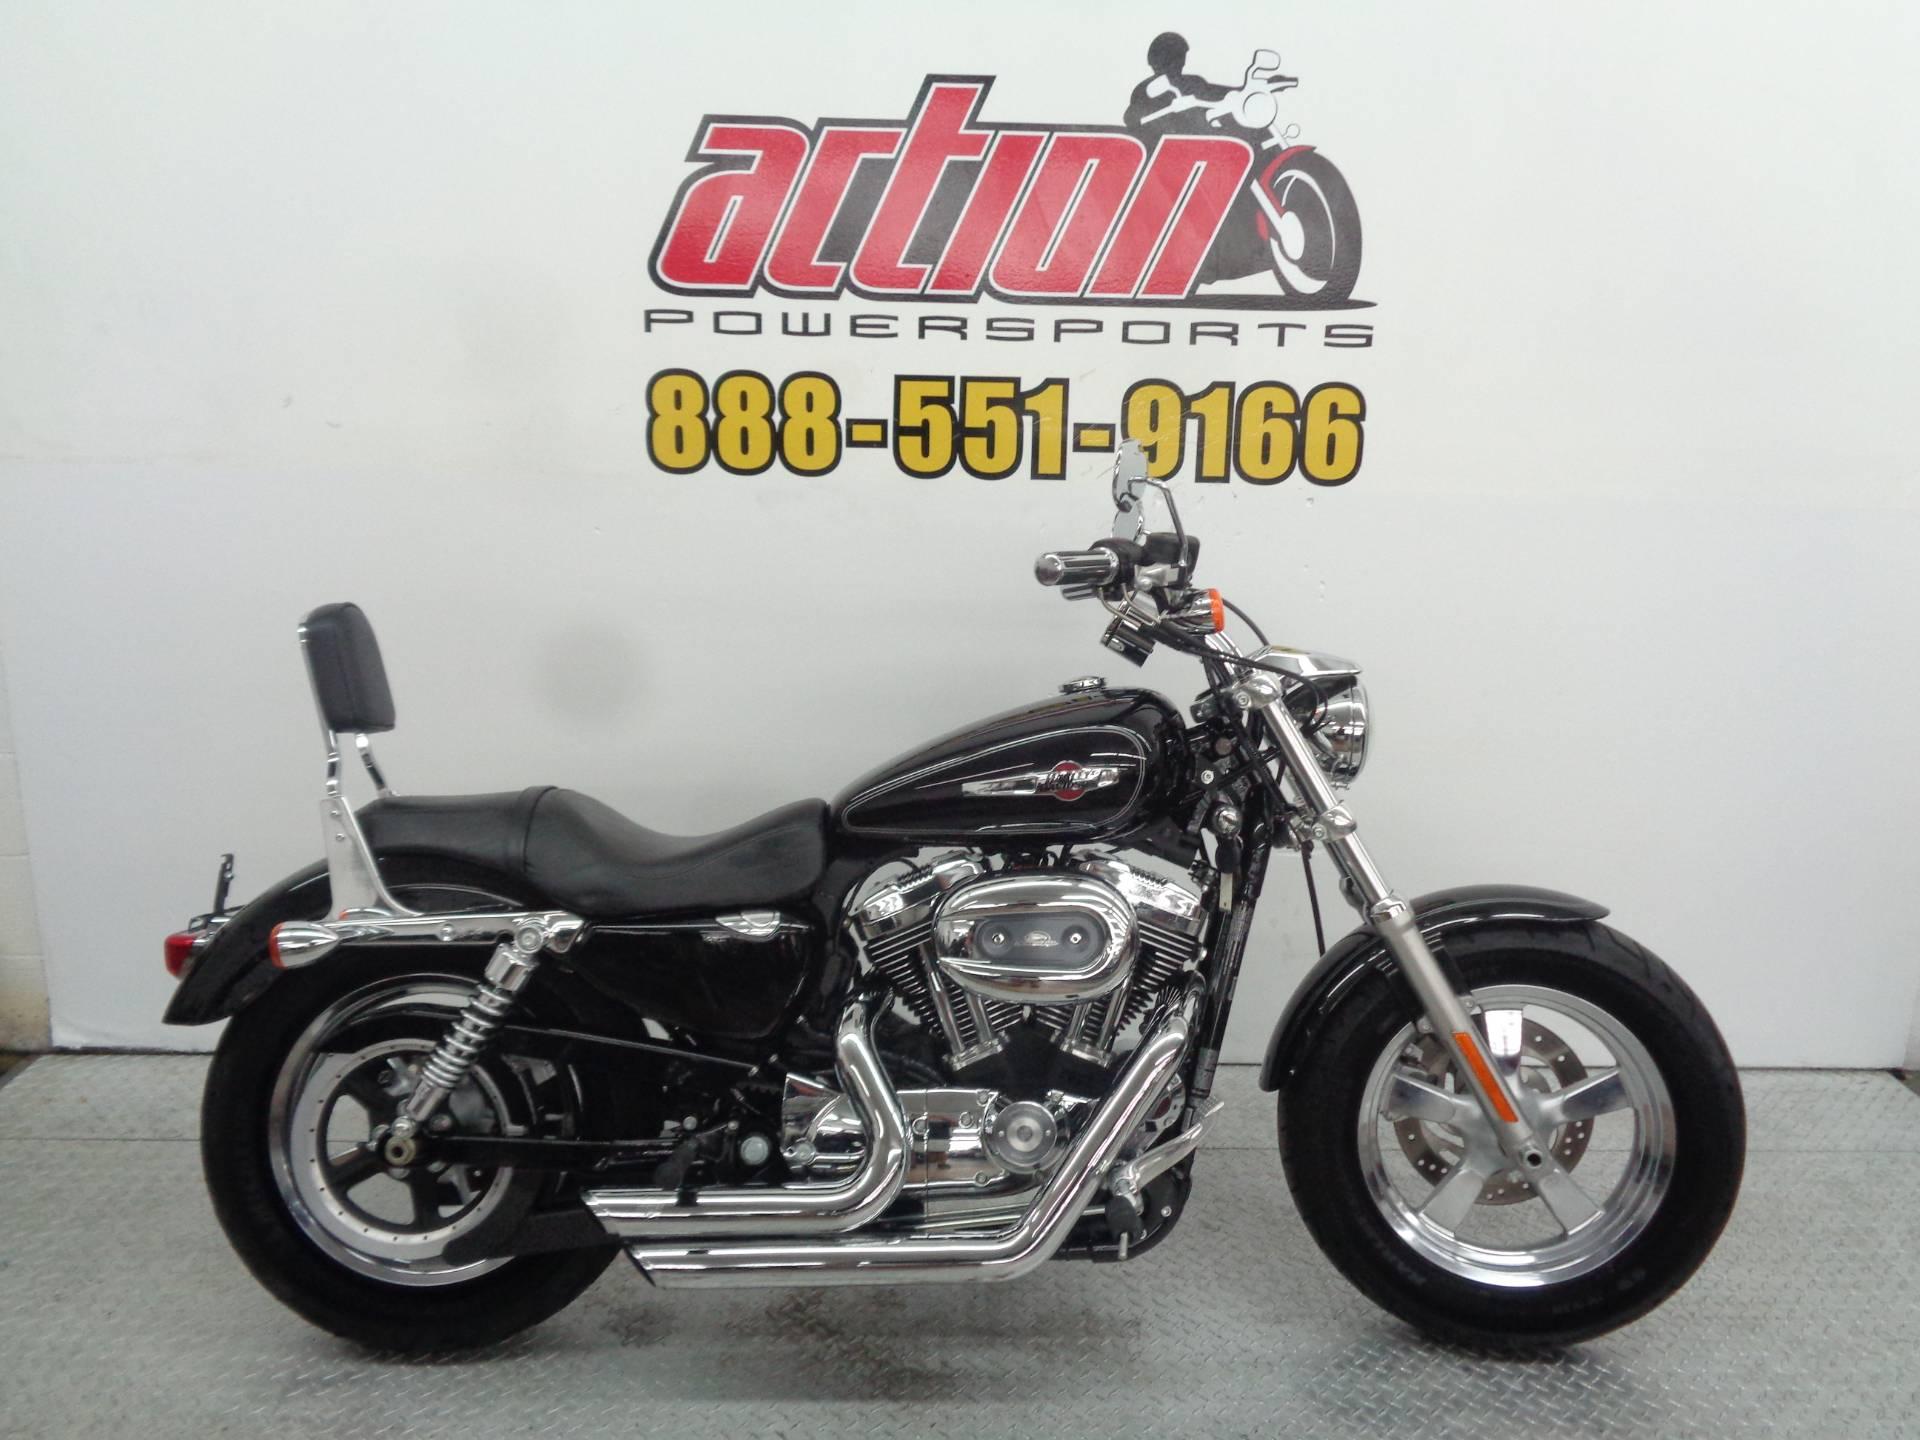 Harley Davidson Motorcycles Tulsa Ok